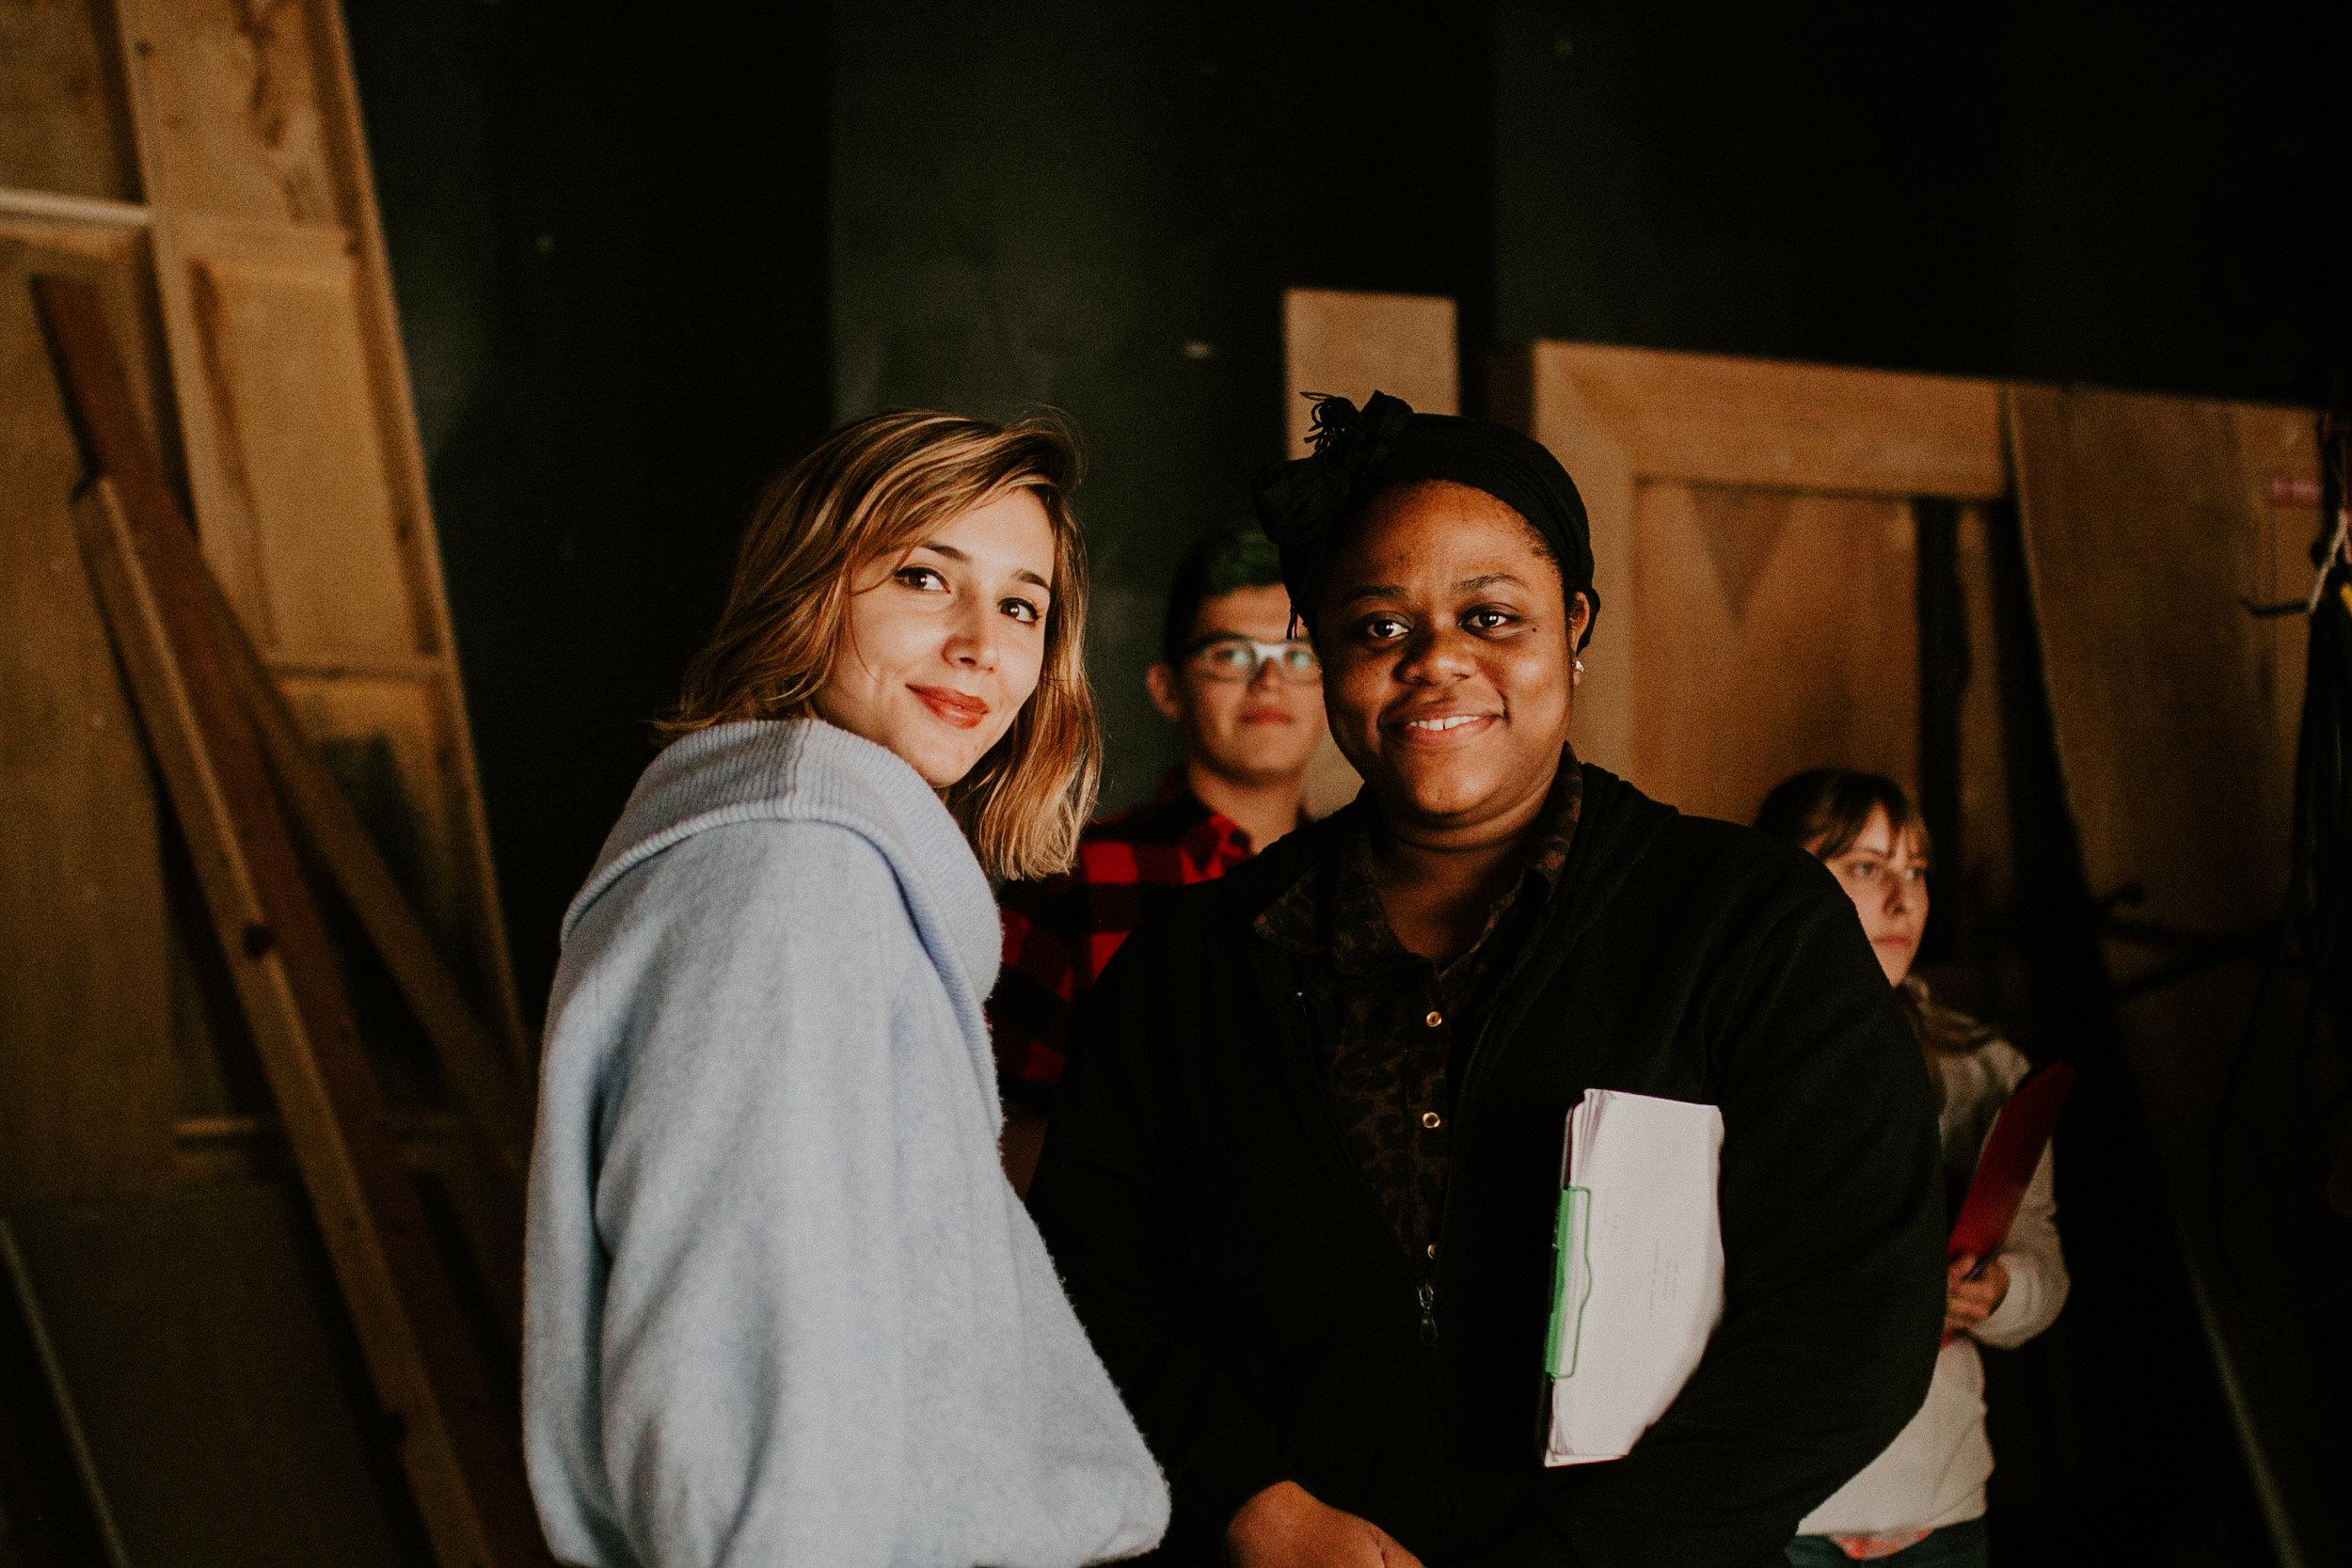 Costume designer Tamara Popovic and Director Krystal Dawkins